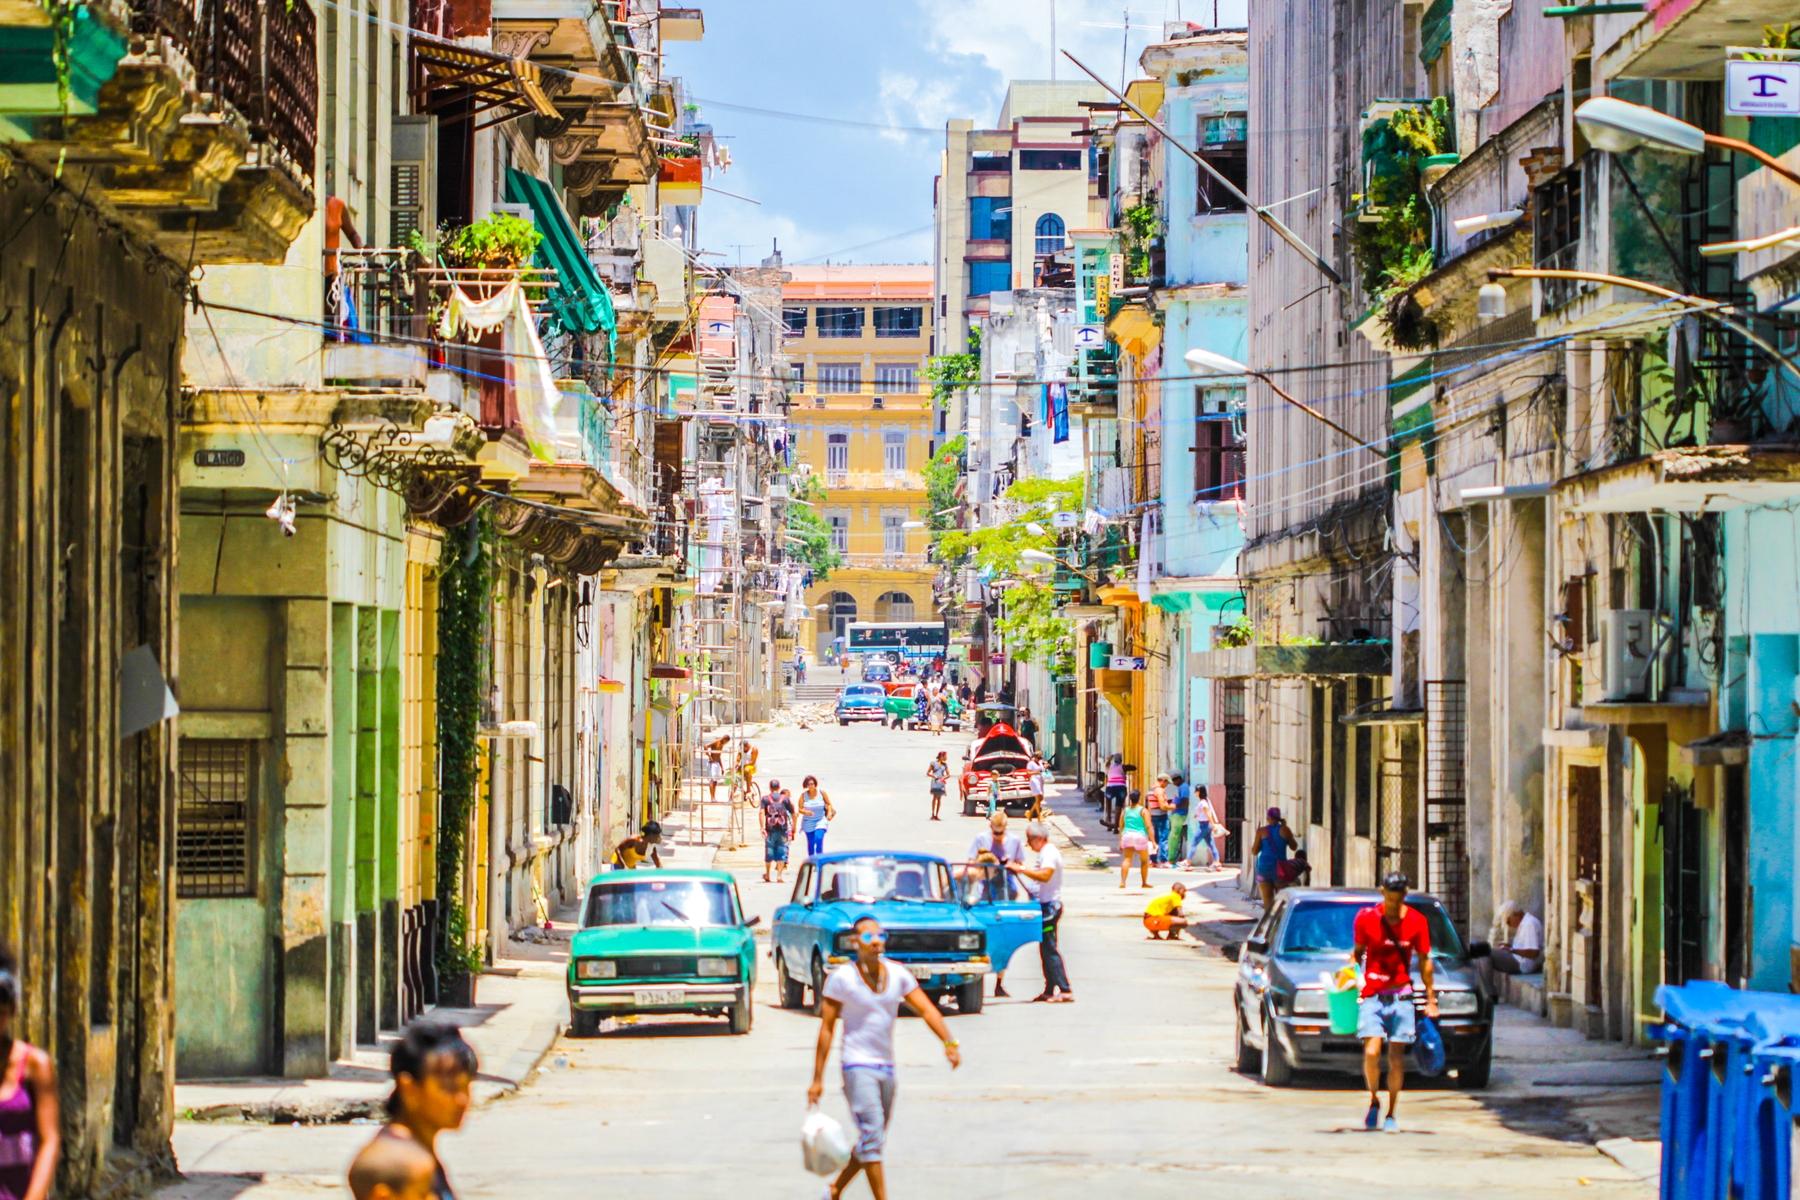 Cuba is hot hot hot in October